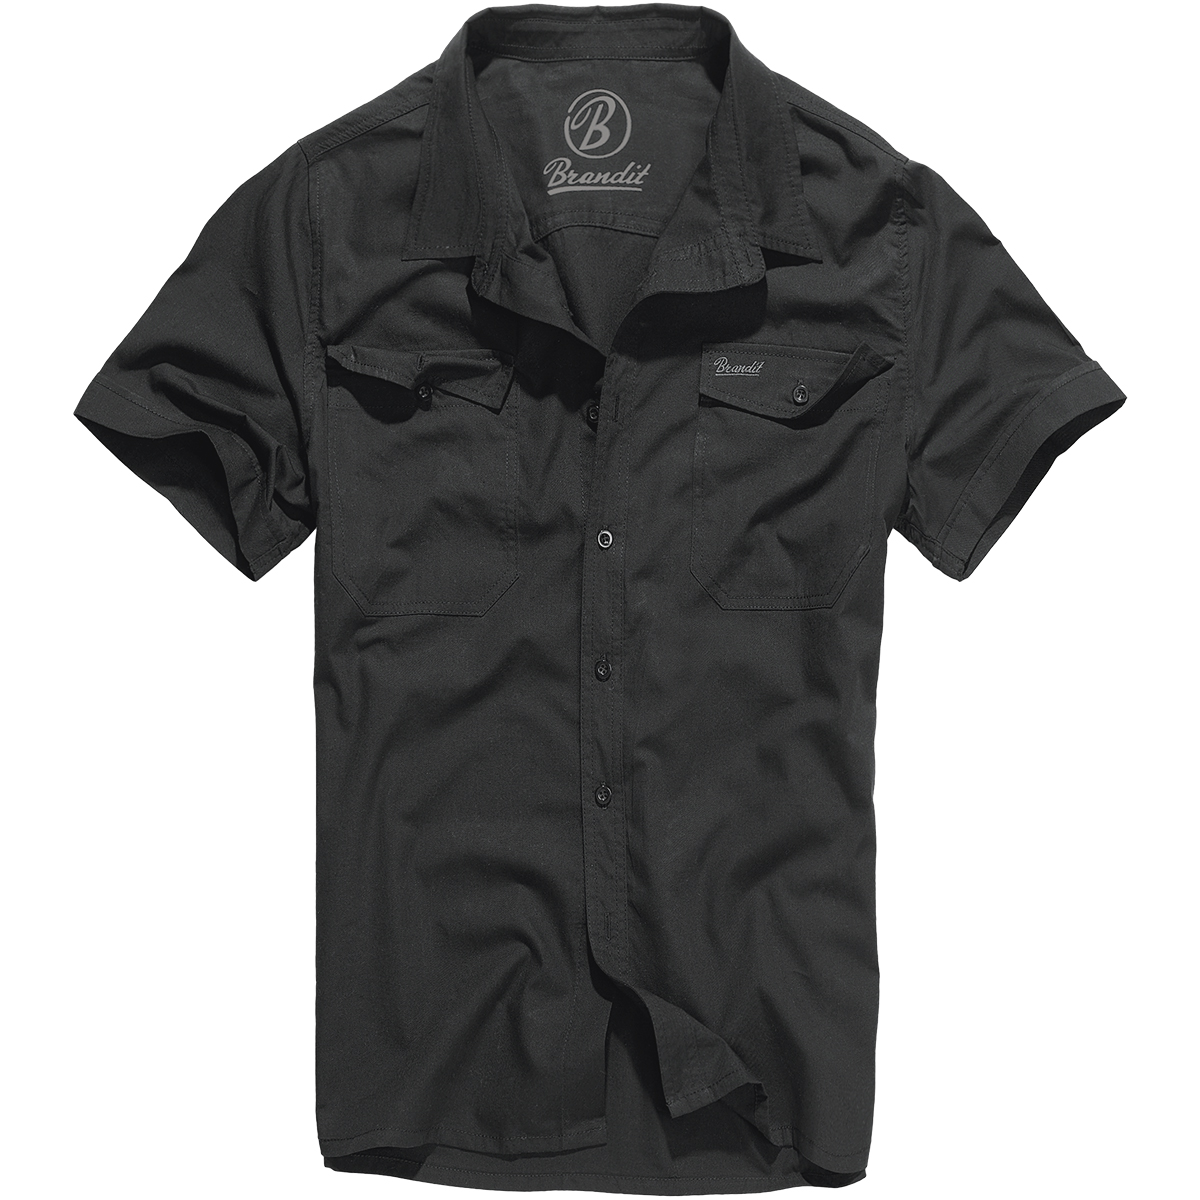 Brandit Roadstar Cotton Check Flannel Top Mens Short Sleeve Sailing Shirt Blue